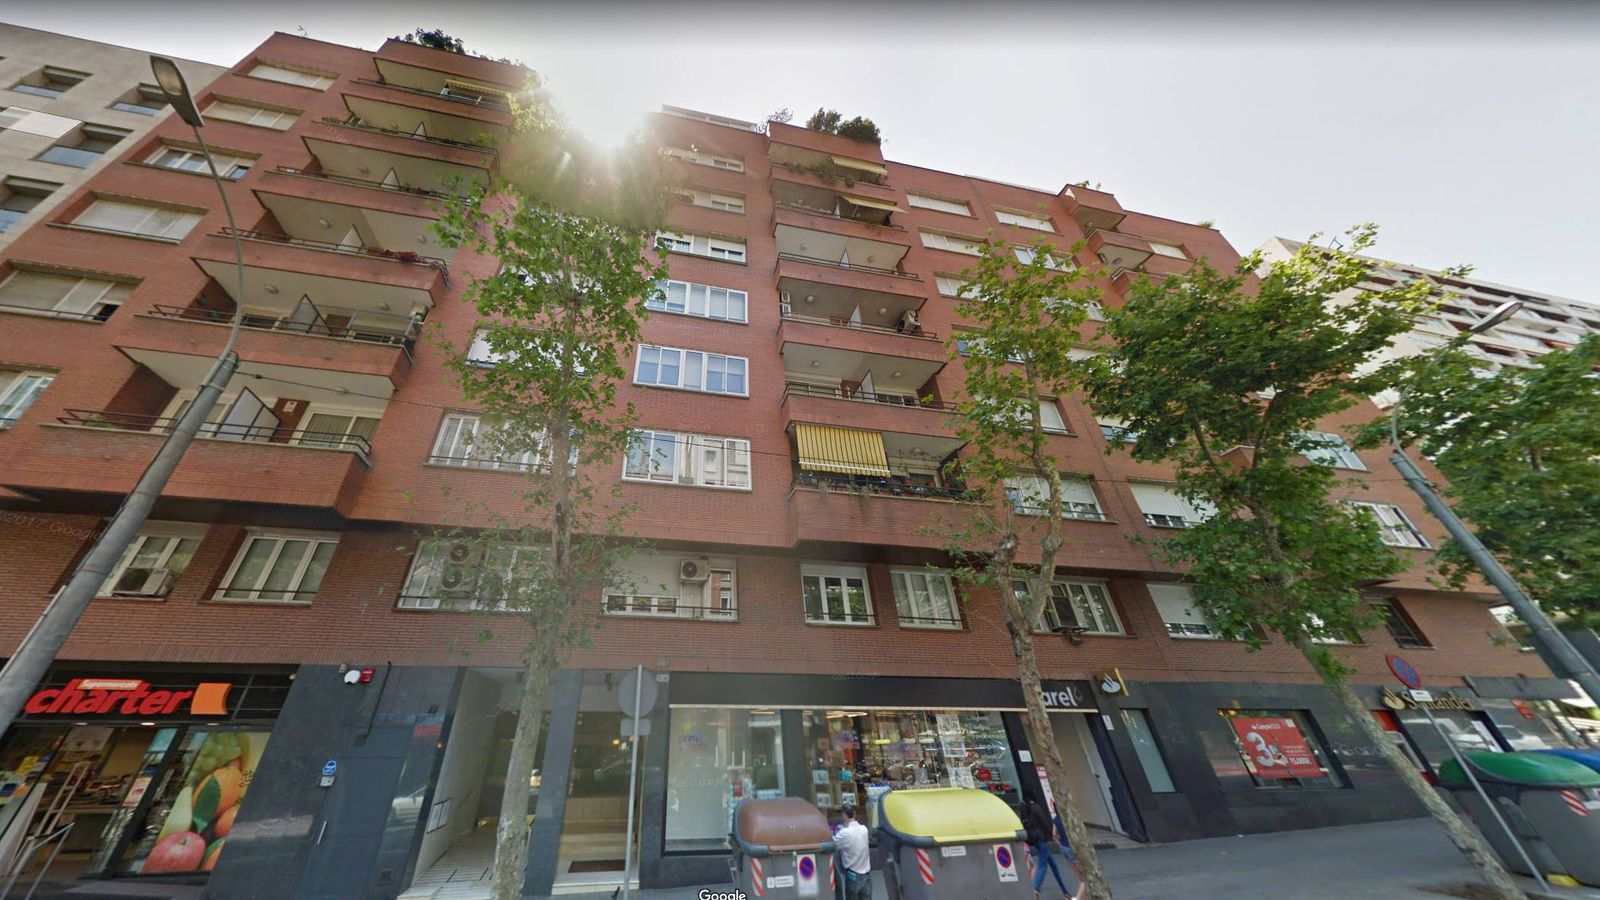 Foto: Número 77 de la calle Numancia, donde el Govern estableció el piso franco. (Google Maps)